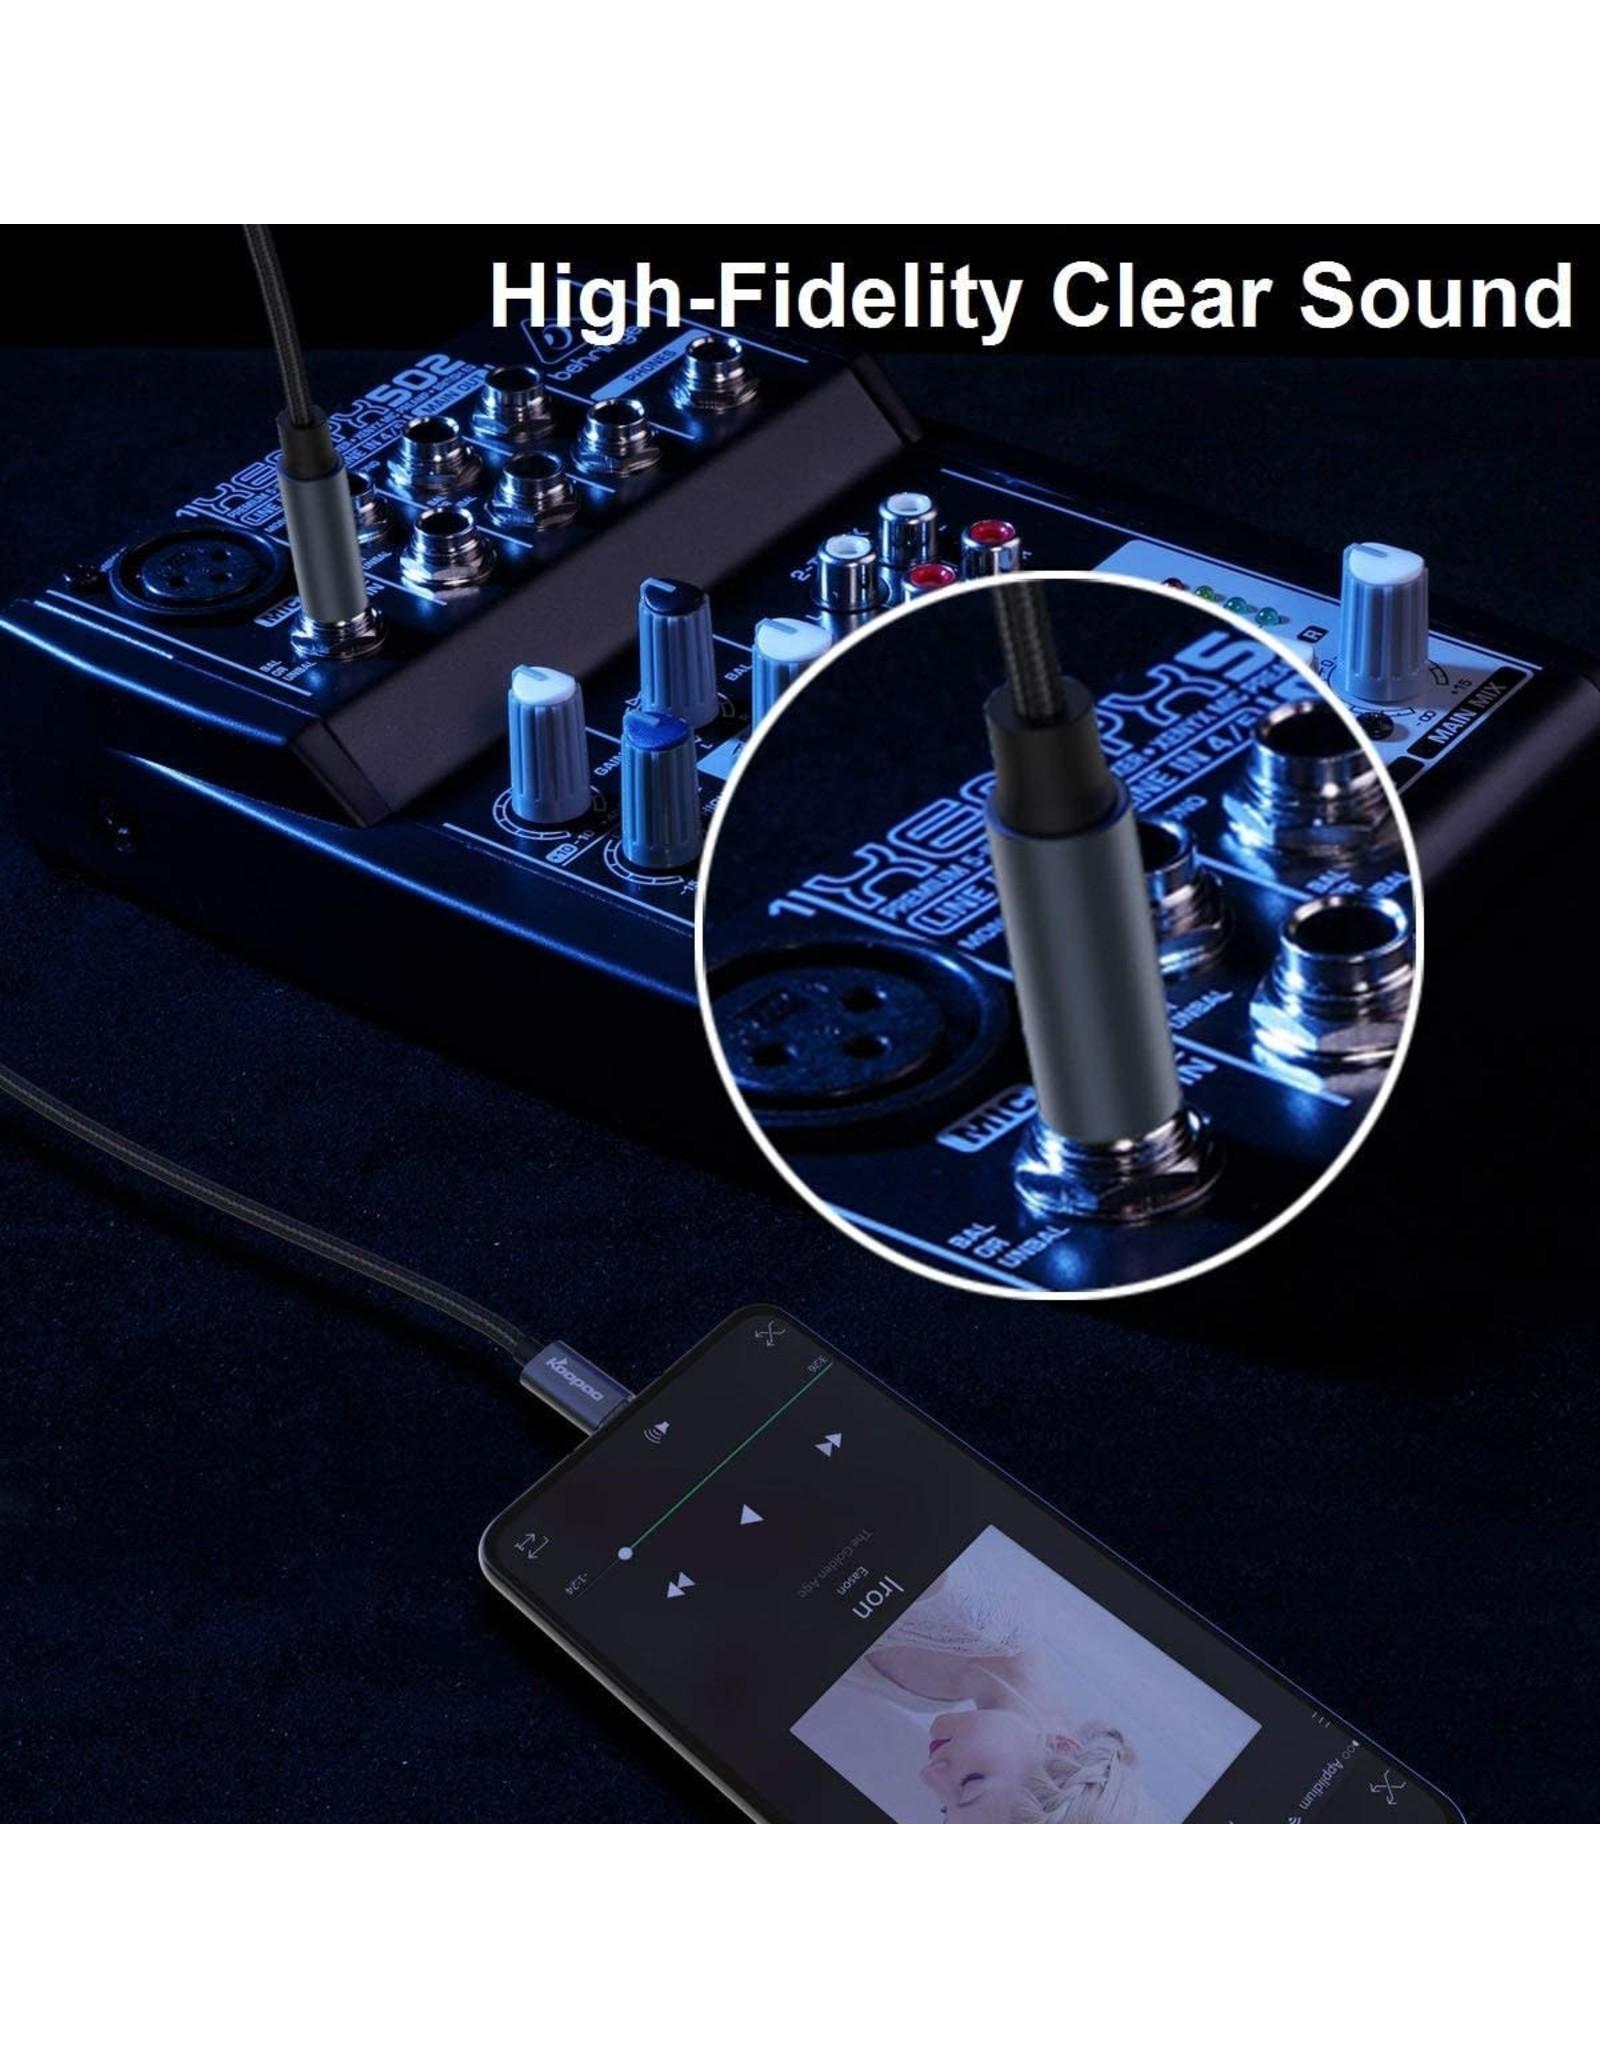 Koopao Koopao USB C to 6.35mm Male 1/4 TRS Audio Stereo Cable 3.28 ft